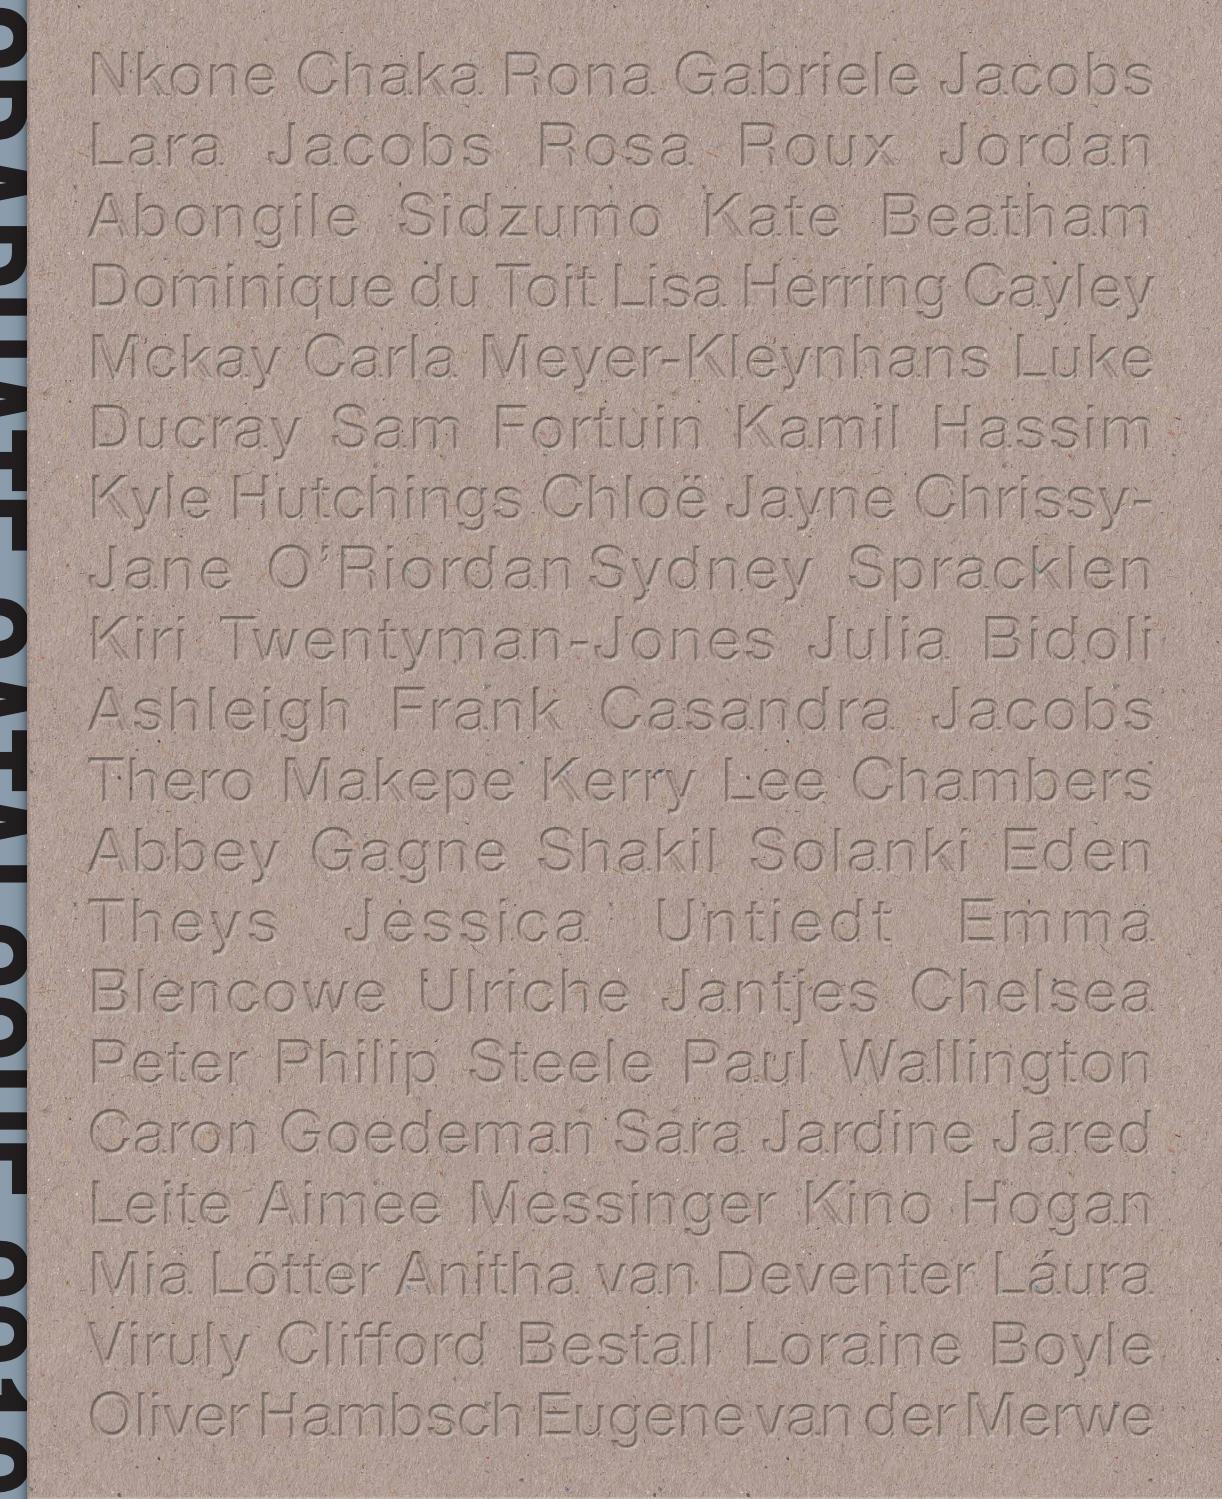 Michaelis School Of Fine Art Graduate Catalogue 2019 By Matthew Bradley Issuu